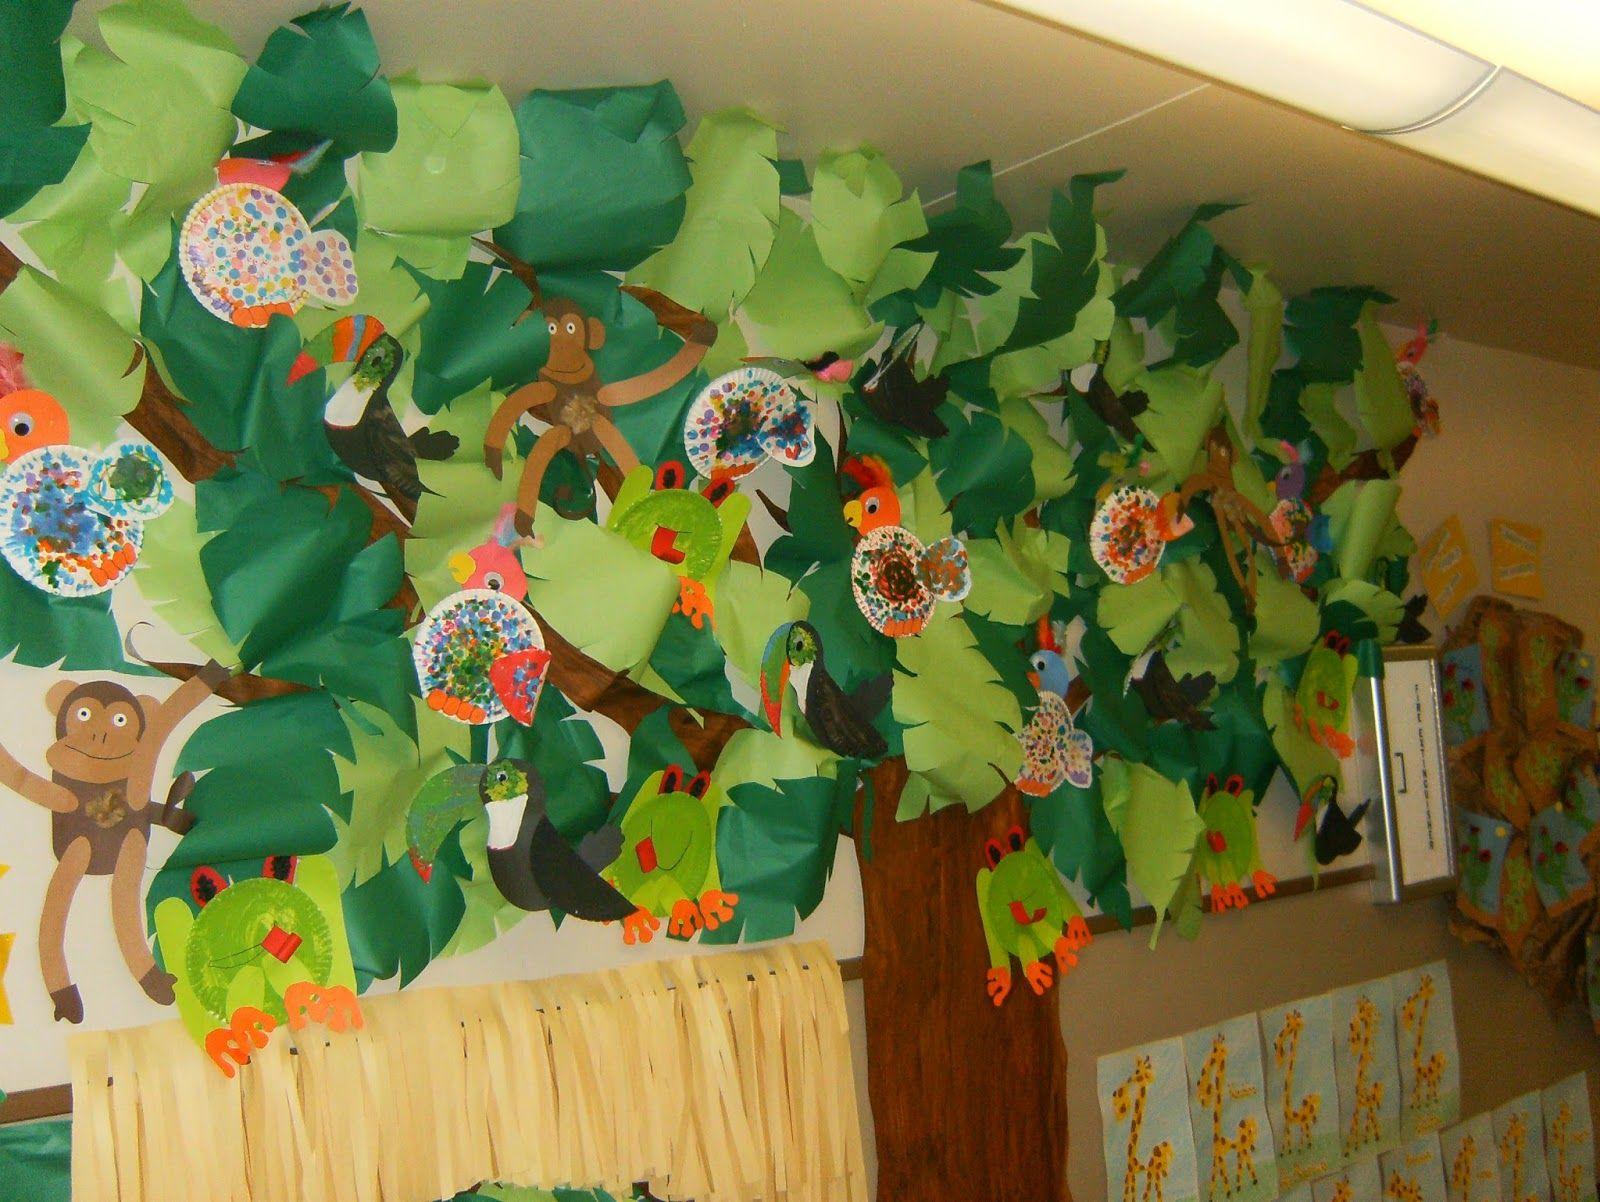 Garden Of Angels Daycare And Preschool